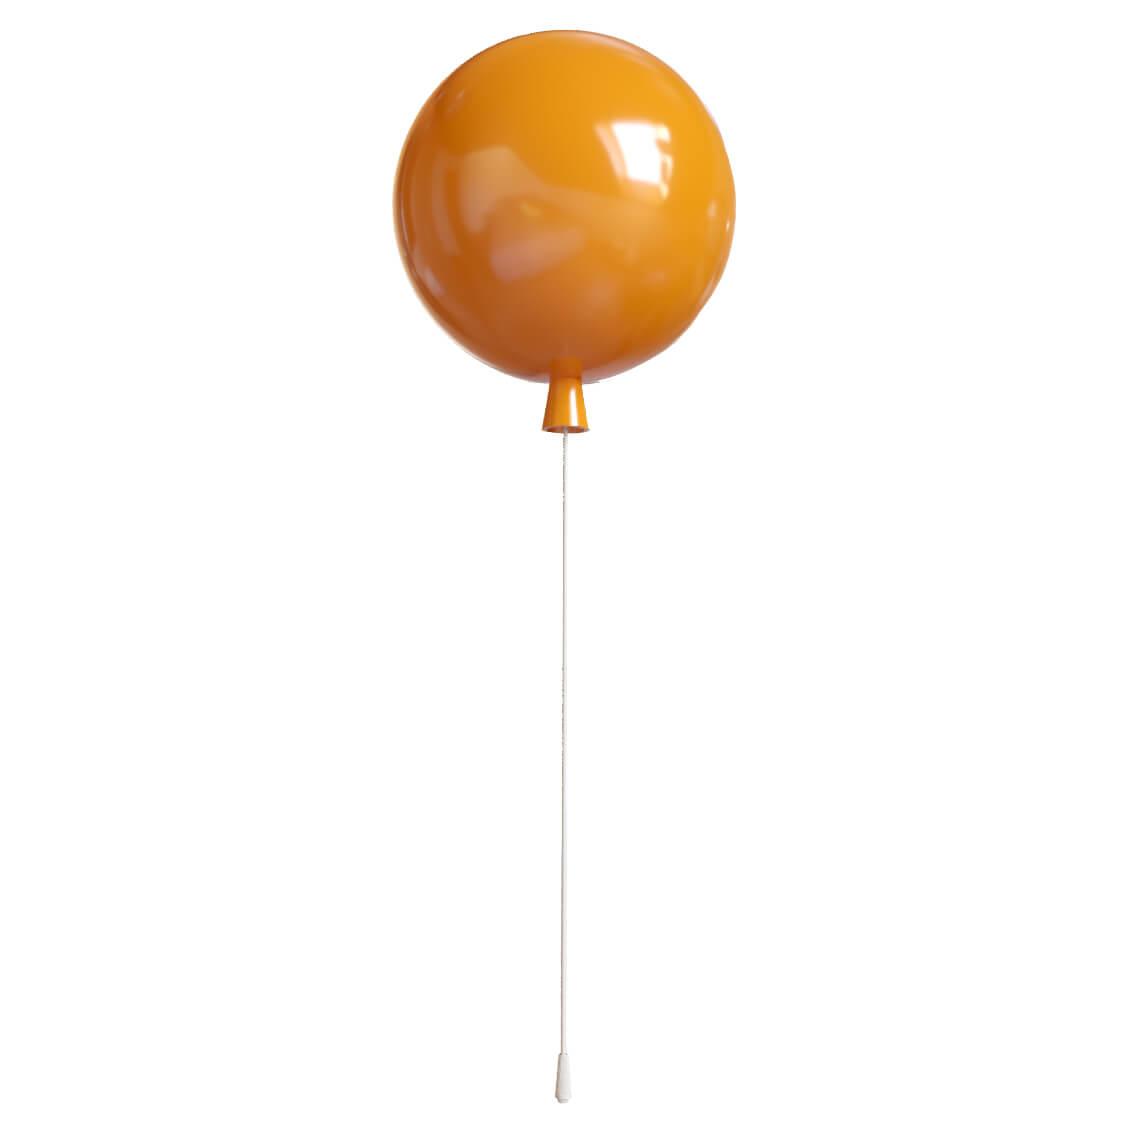 Светильник Loft IT 5055C/S orange 5055 orange светильник loft it 5055c s red 5055 red